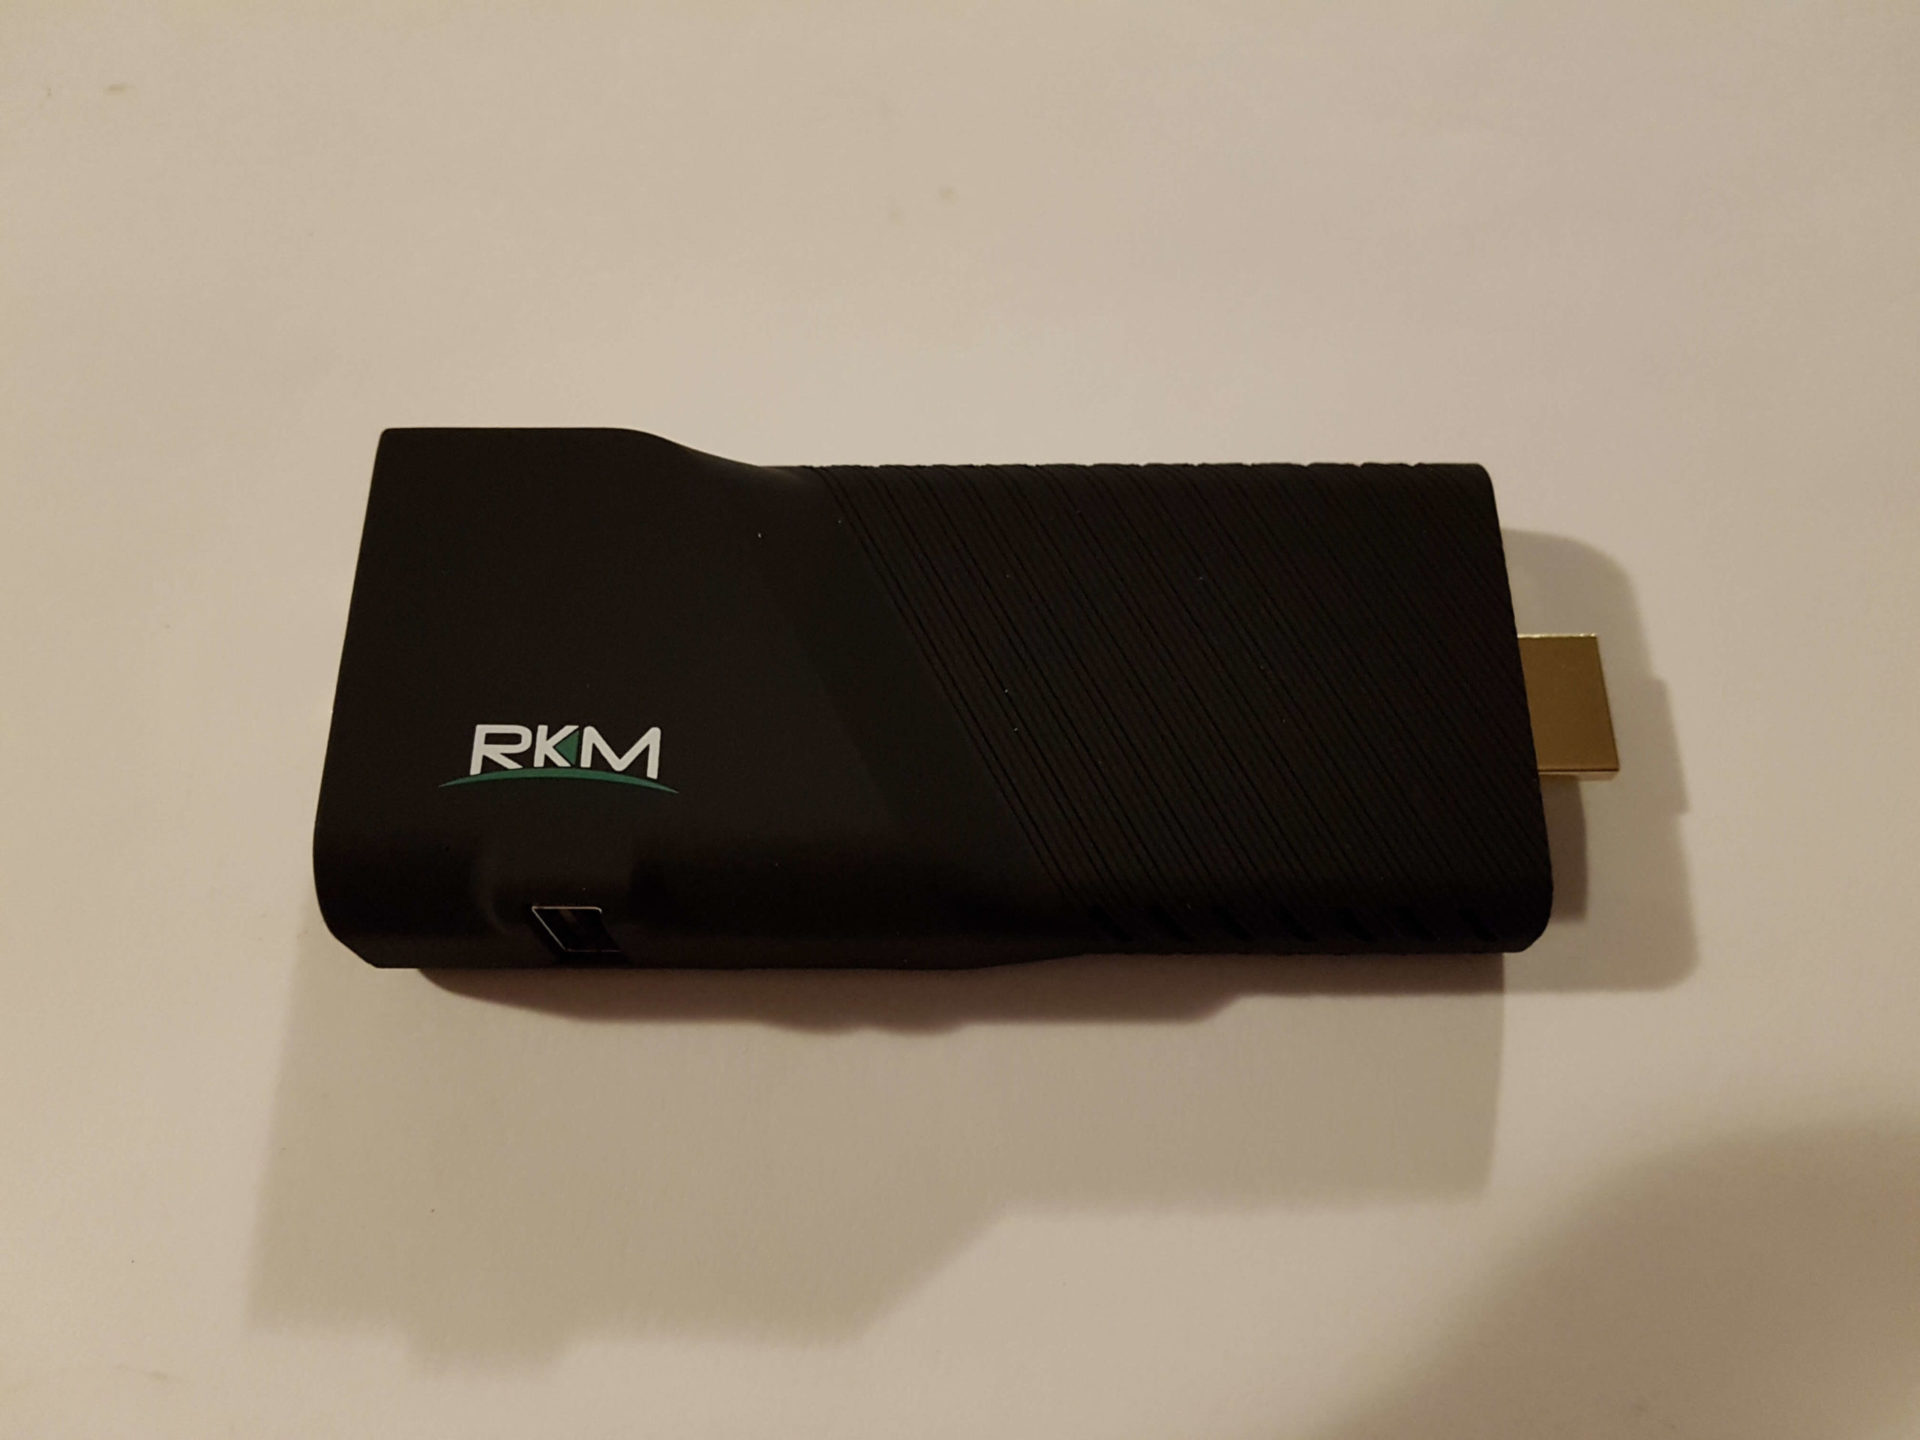 Rikomagic V3 review